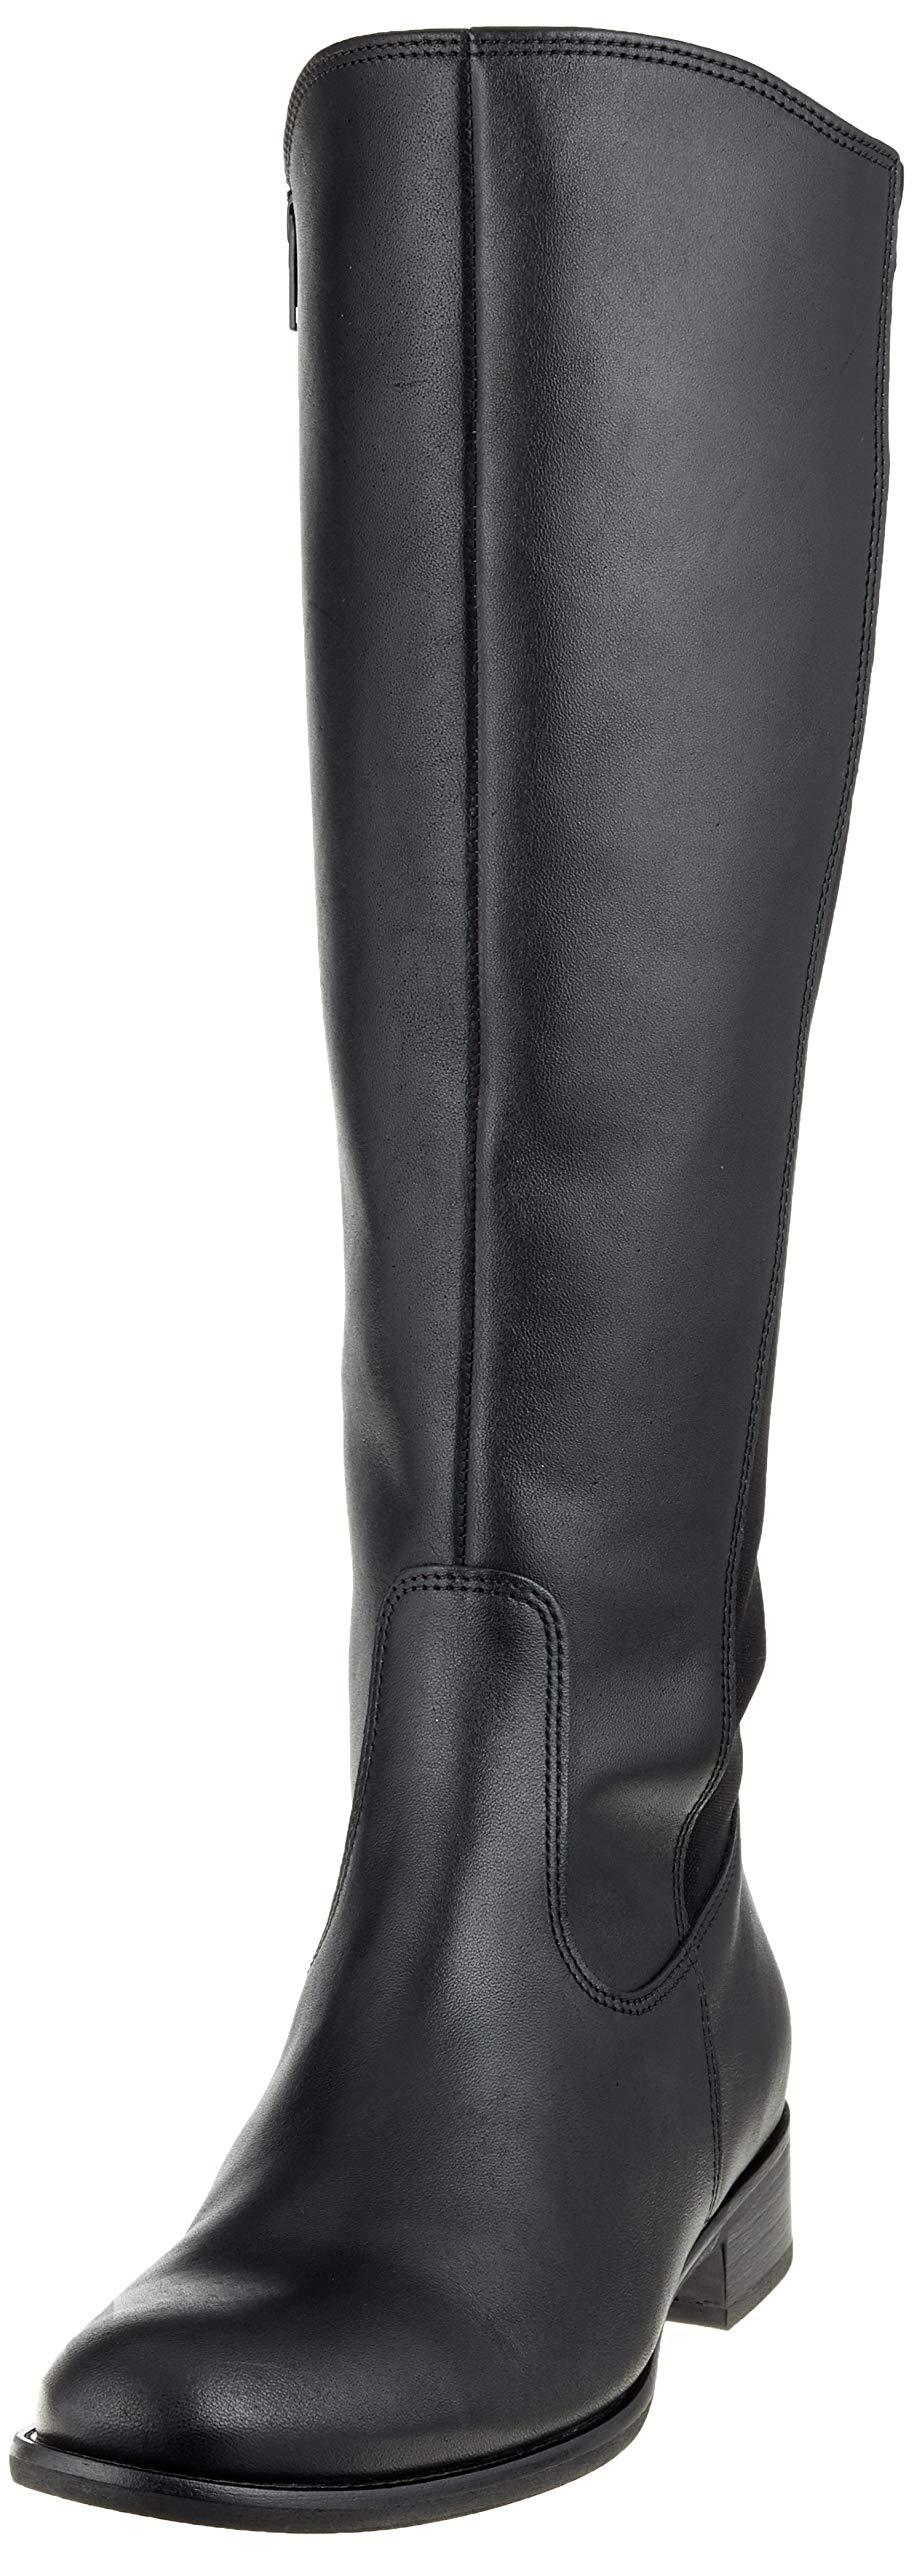 Shoes Eu Gabor FemmeNoirschwarzmicro2739 Hautes FashionBottes 0wOX8knP